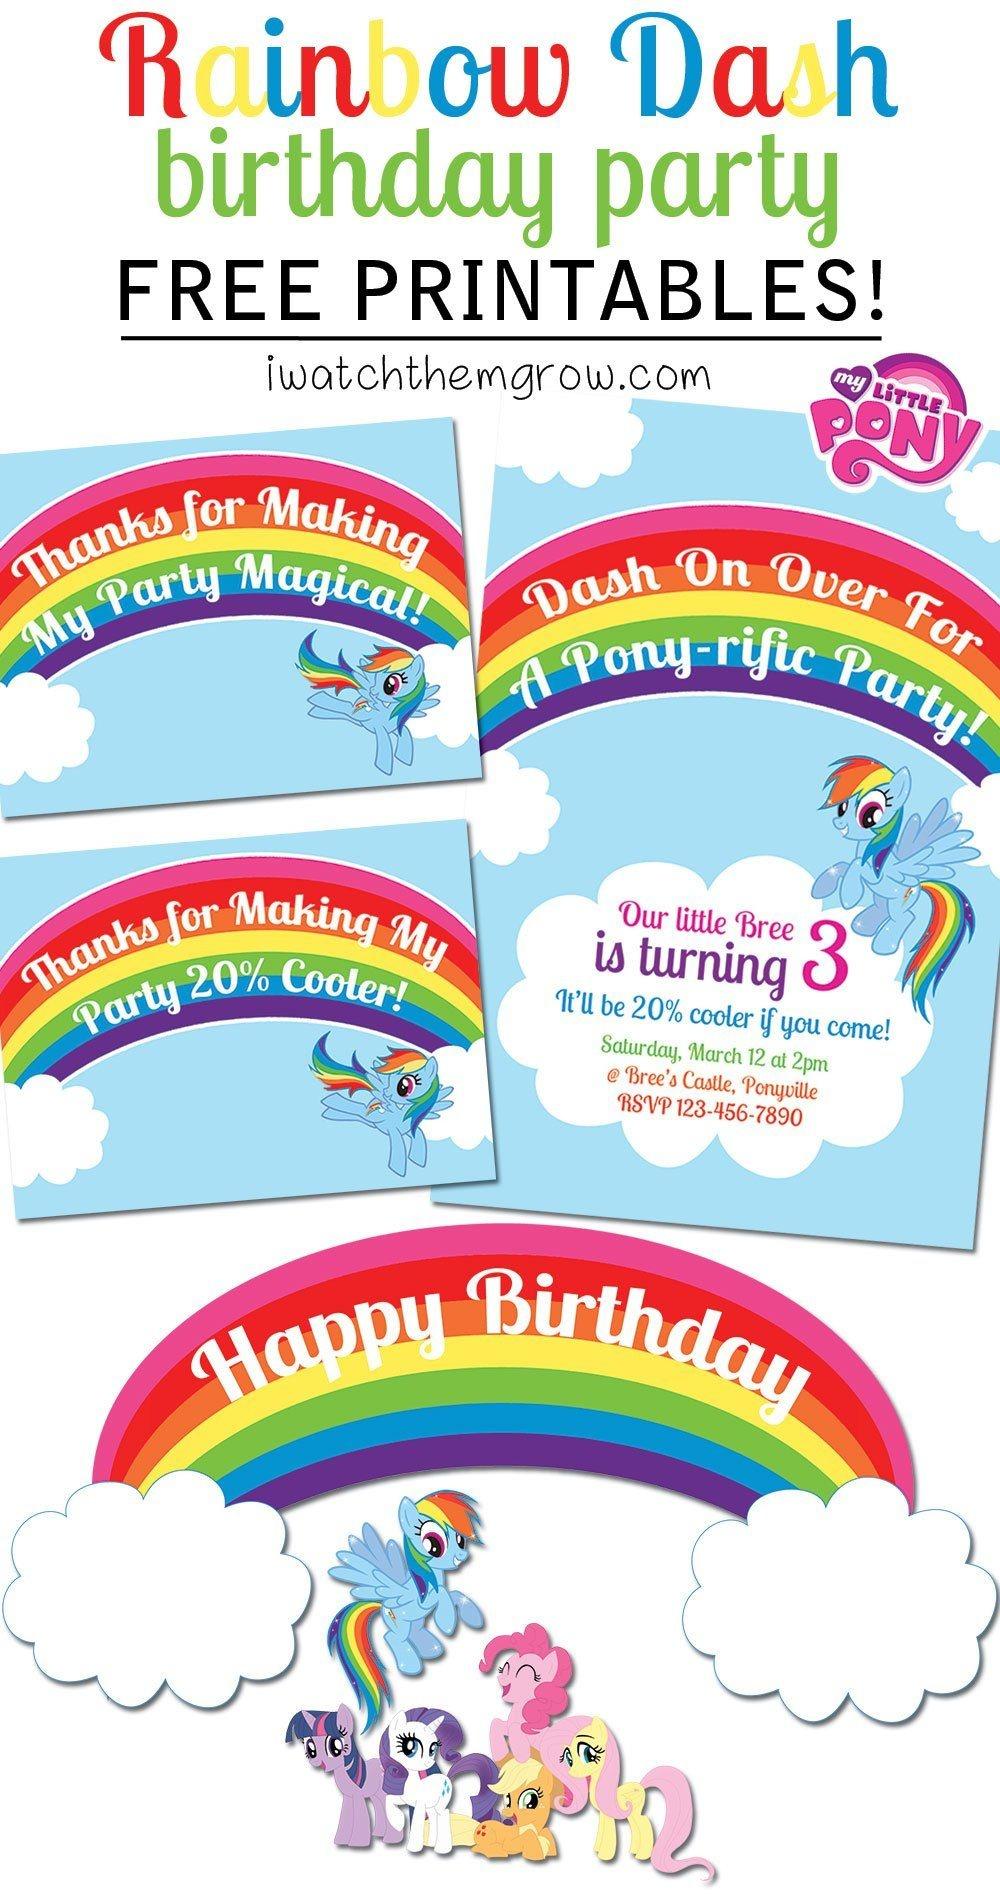 My Little Pony Rainbow Dash Birthday Party Printables | Aniversare 7 - Free My Little Pony Party Printables